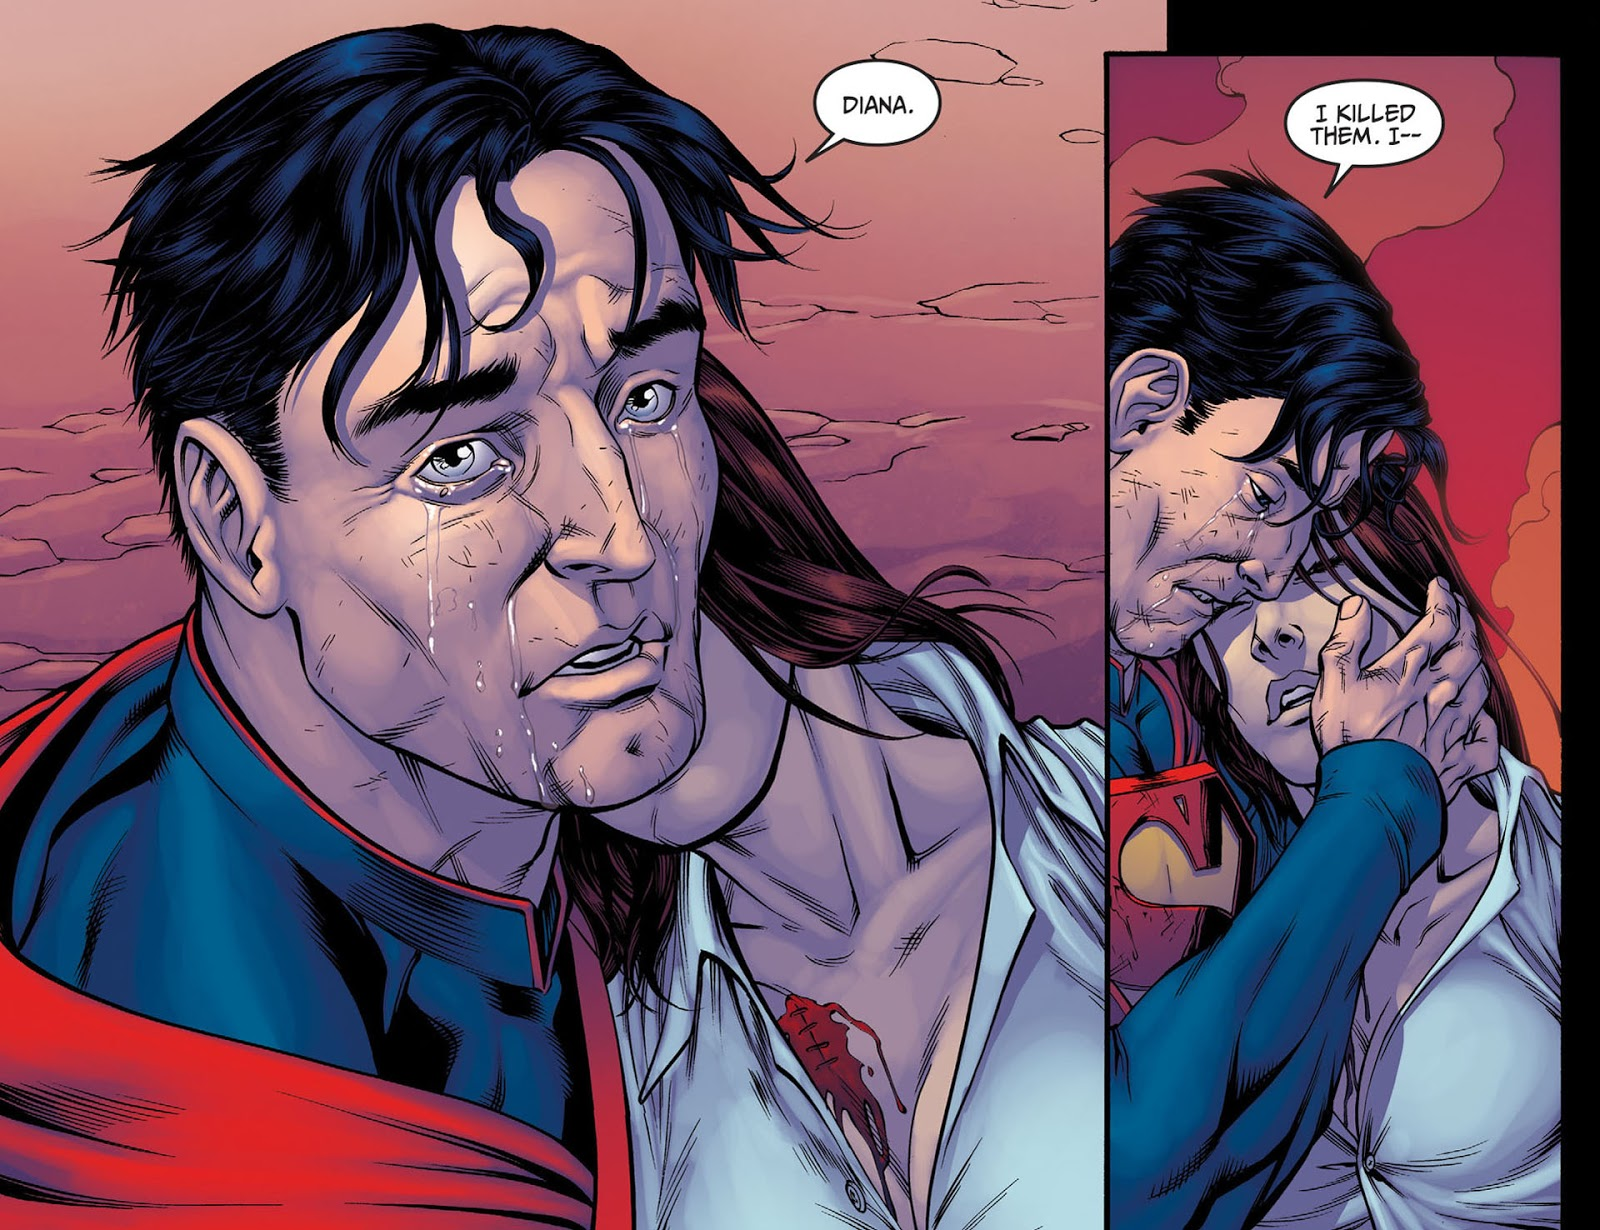 COMIC BOOK FAN AND LOVER: INJUSTICE: DIOSES ENTRE NOSOTROS # 4 - DC ...